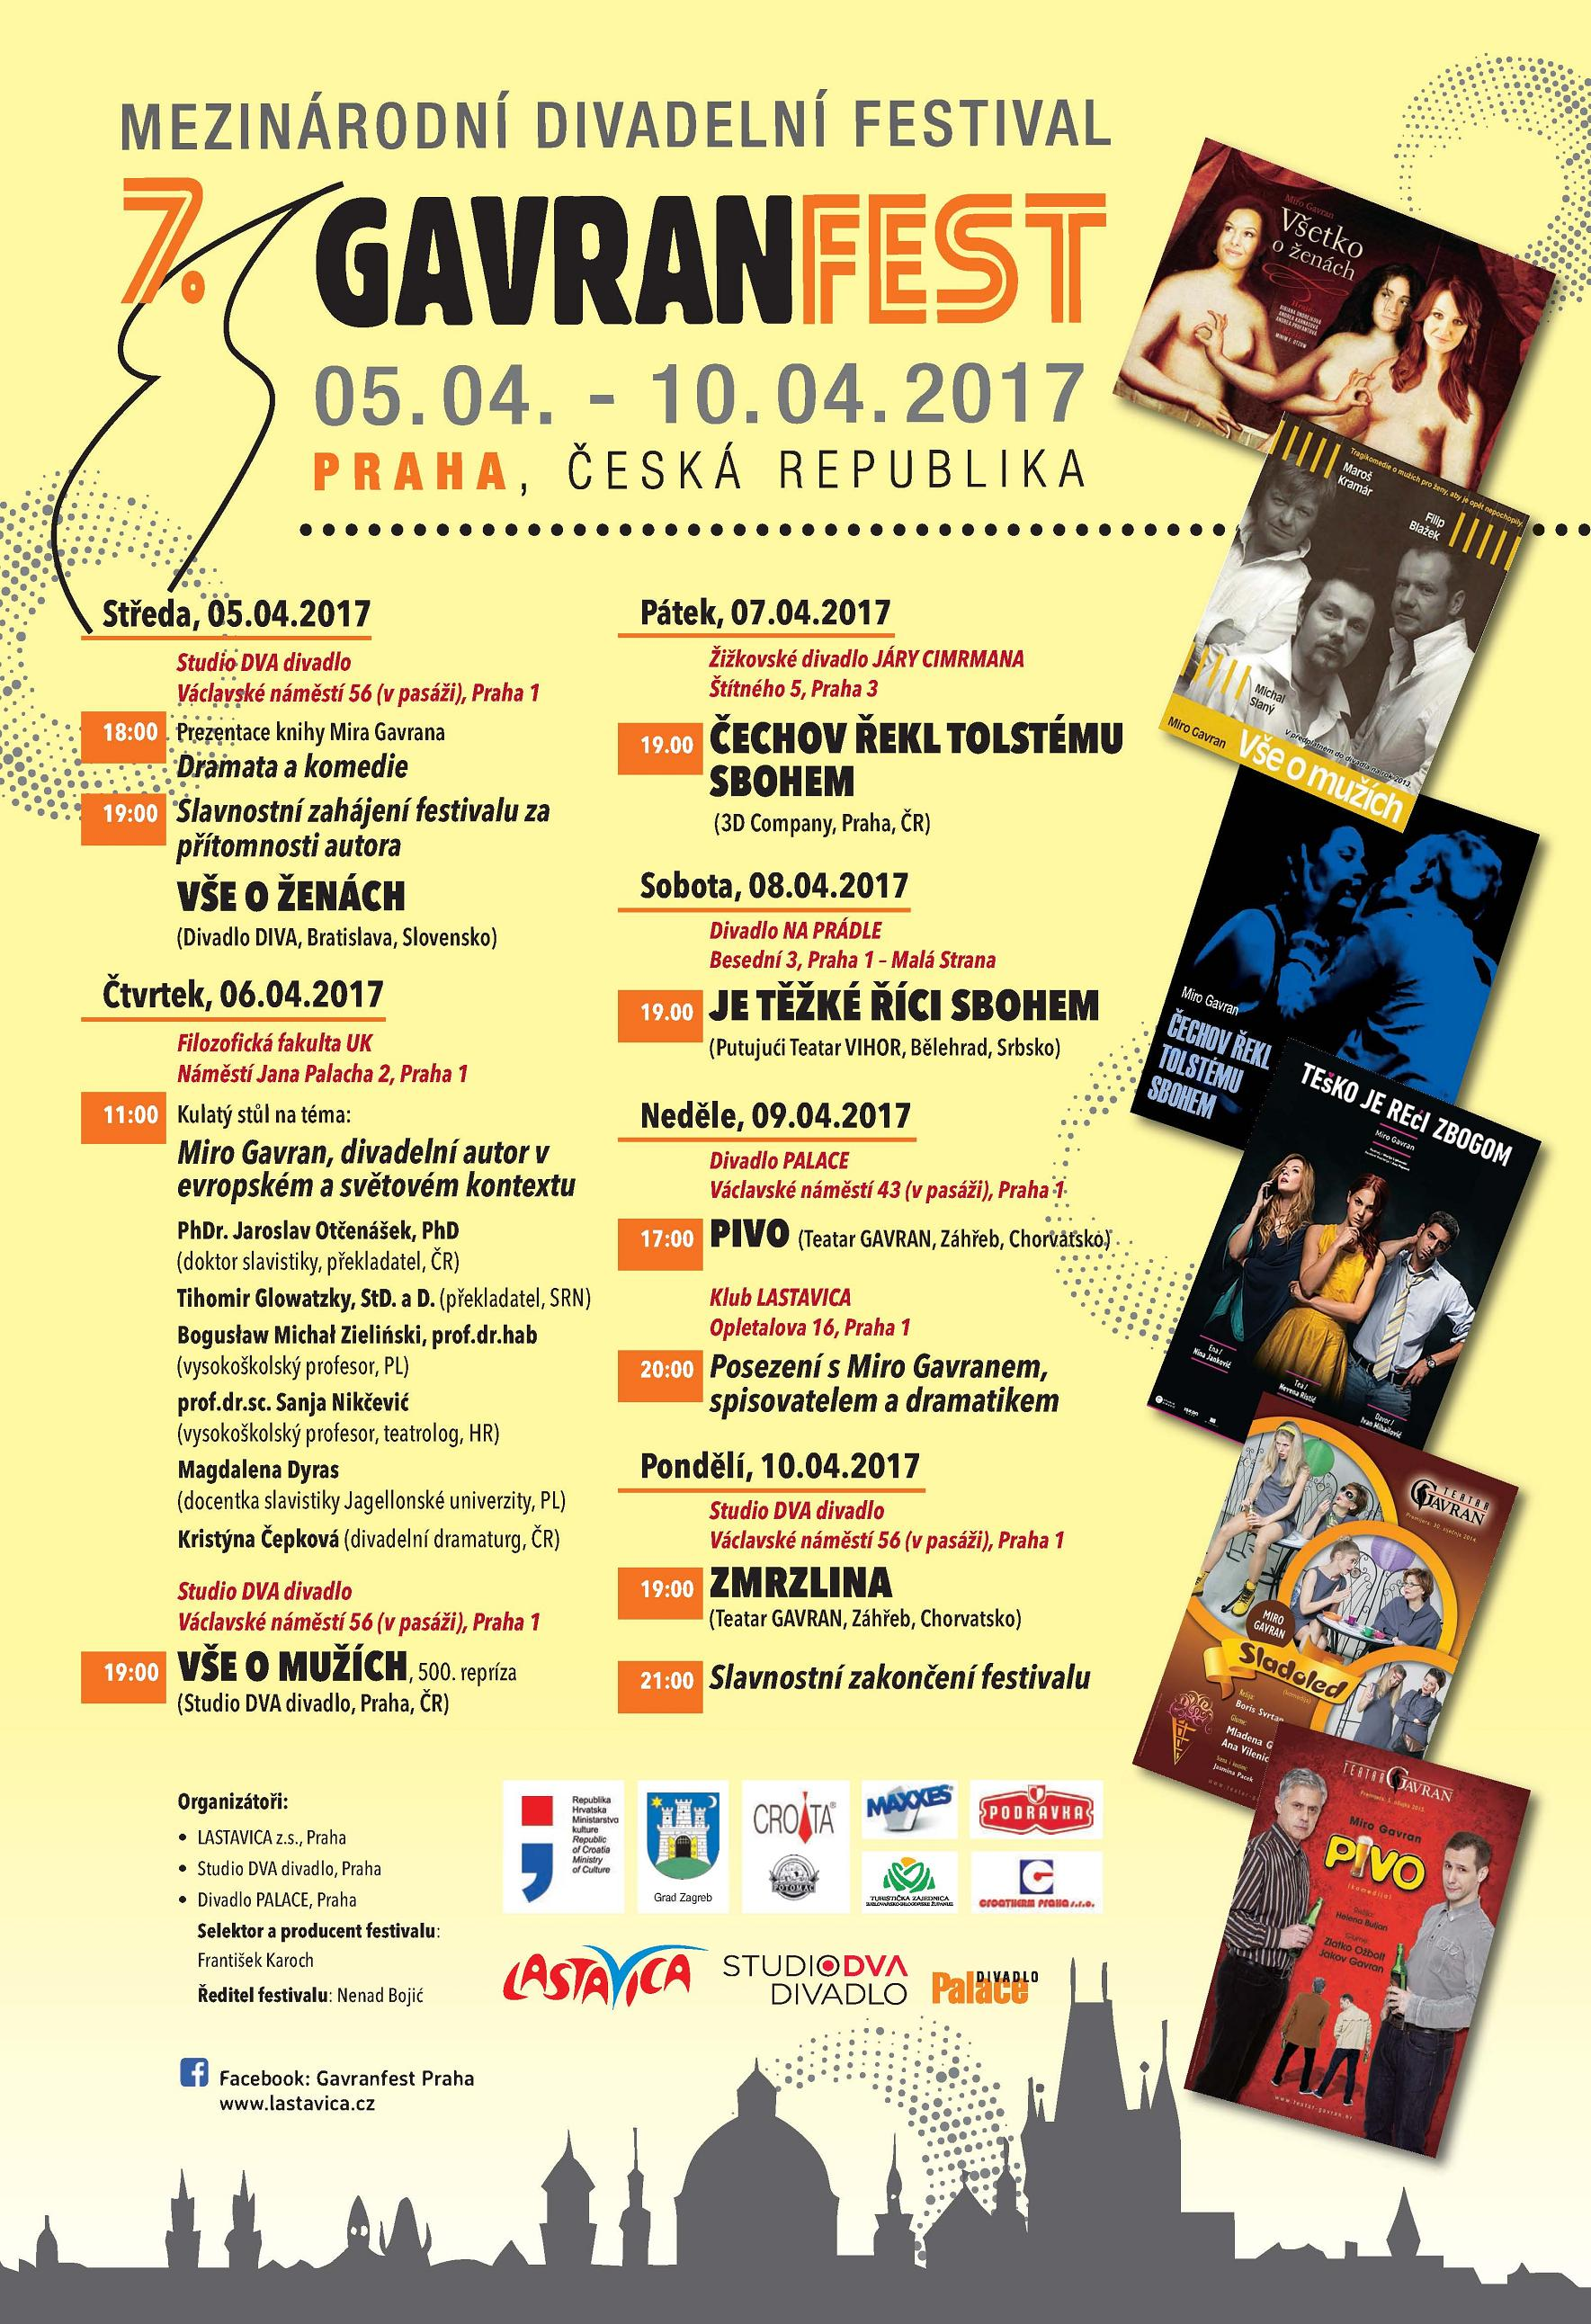 Uskoro počinje sedmi GavranFest u Pragu / SEVENTH GAVRANFEST IN PRAGUE